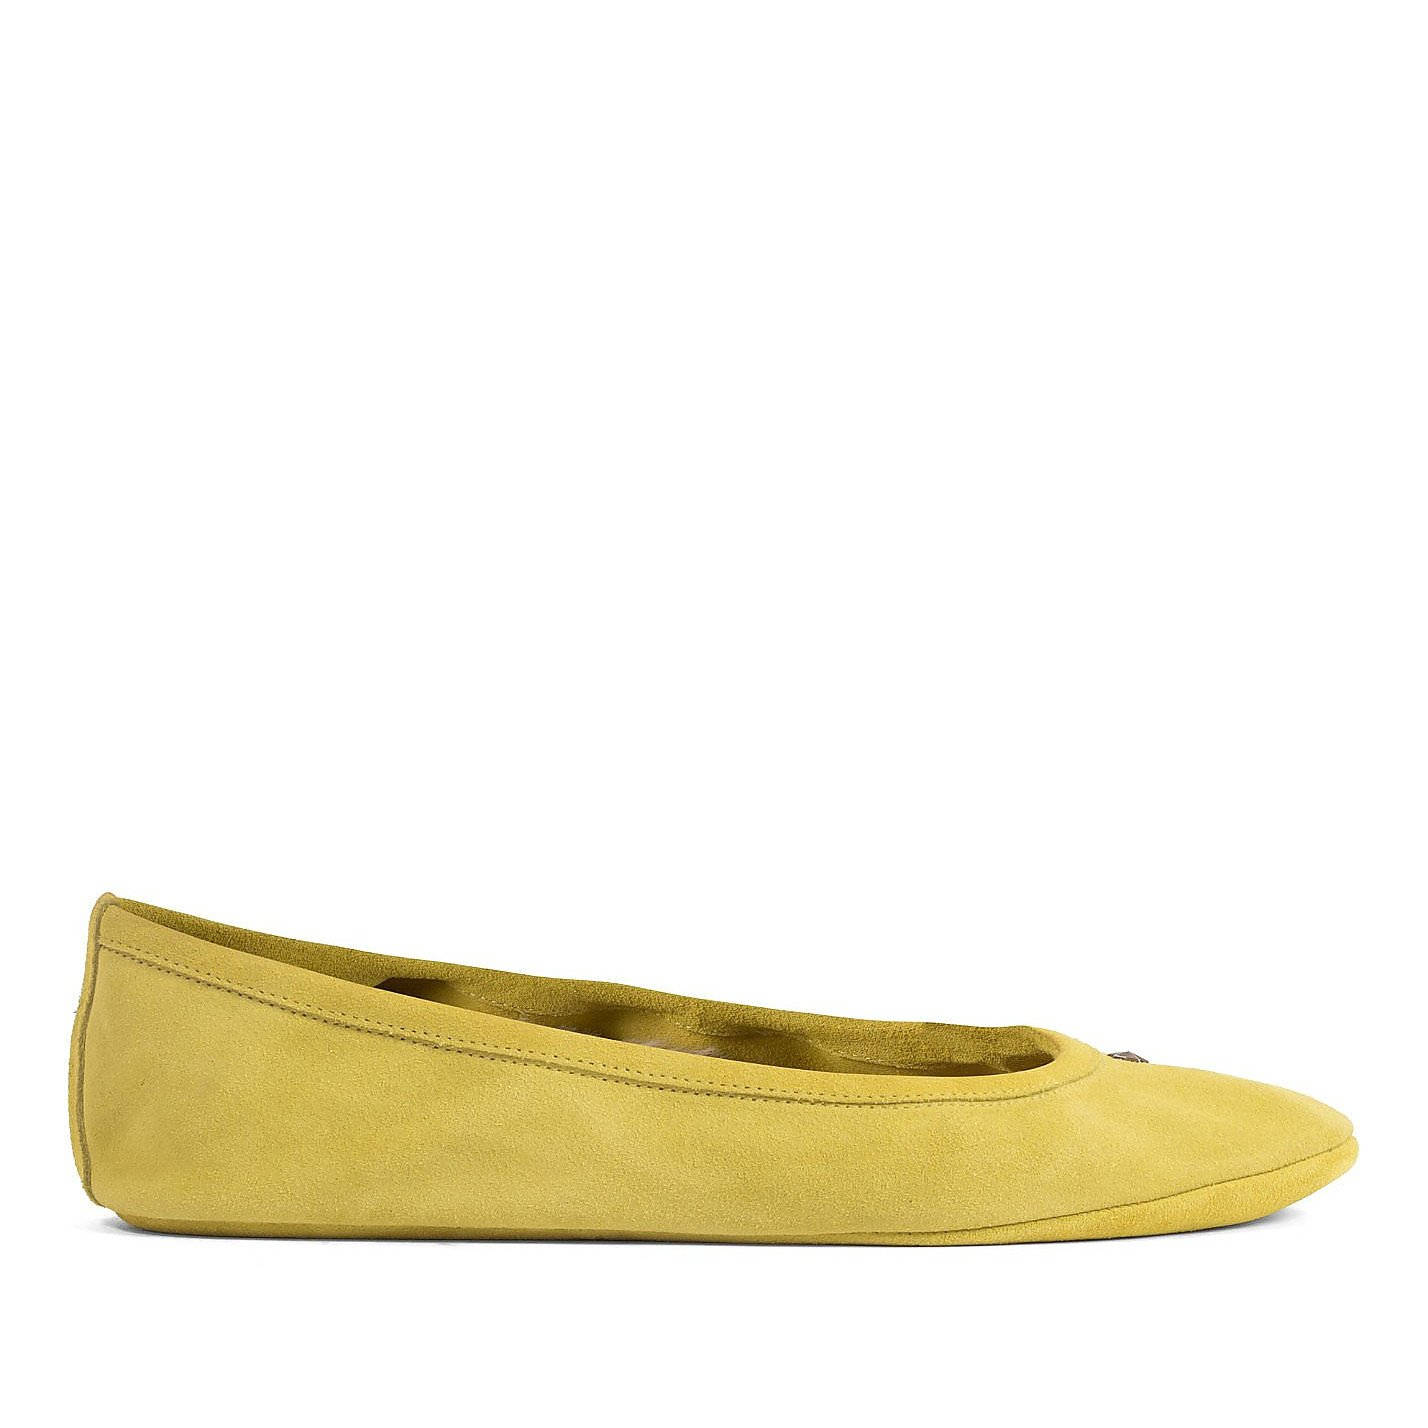 Jimmy Choo Suede Ballet Flat Slippers